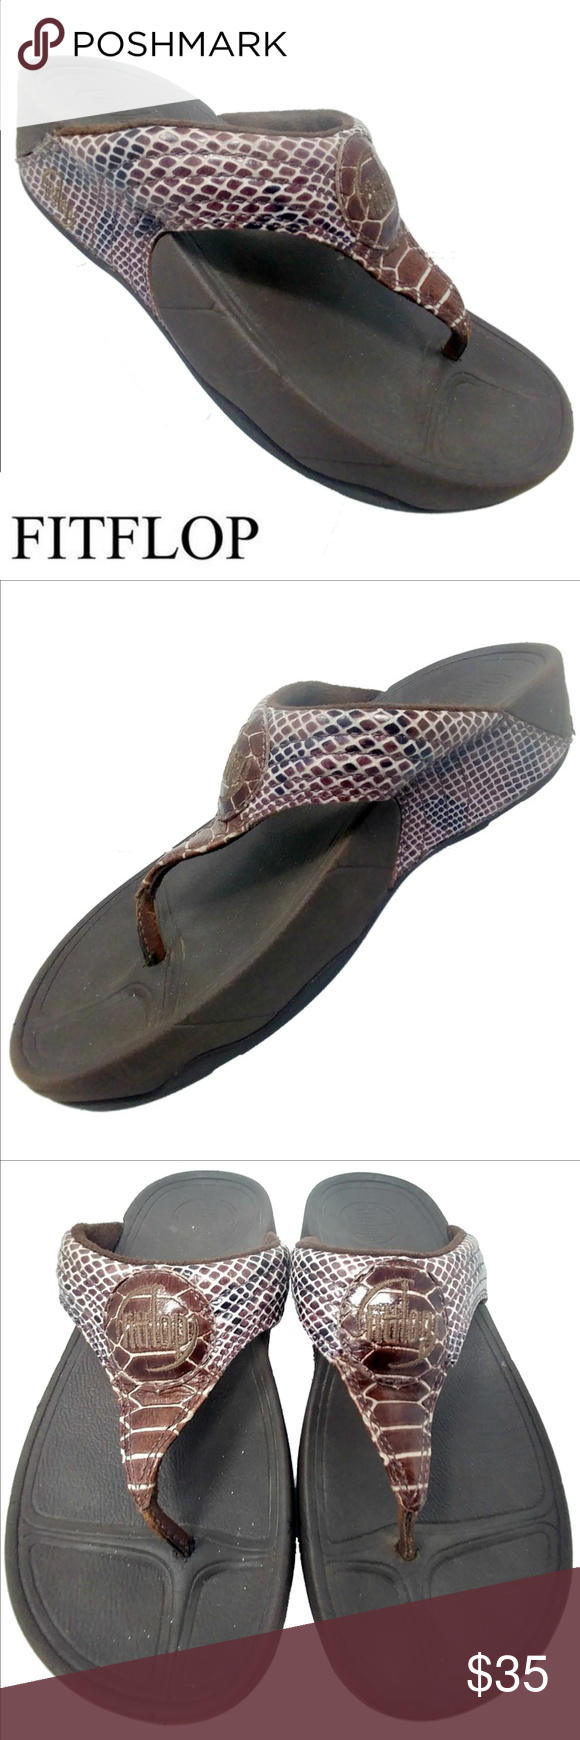 bb99d7f4d5dd FitFlop Walkstar 3 Snake Print Sandals Sepia Sz 5 FitFlop 036-066 Walkstar  brown snake toning sandal. Super cute and very comfy. WOMEN S SIZE  US 5 EU  36 ...